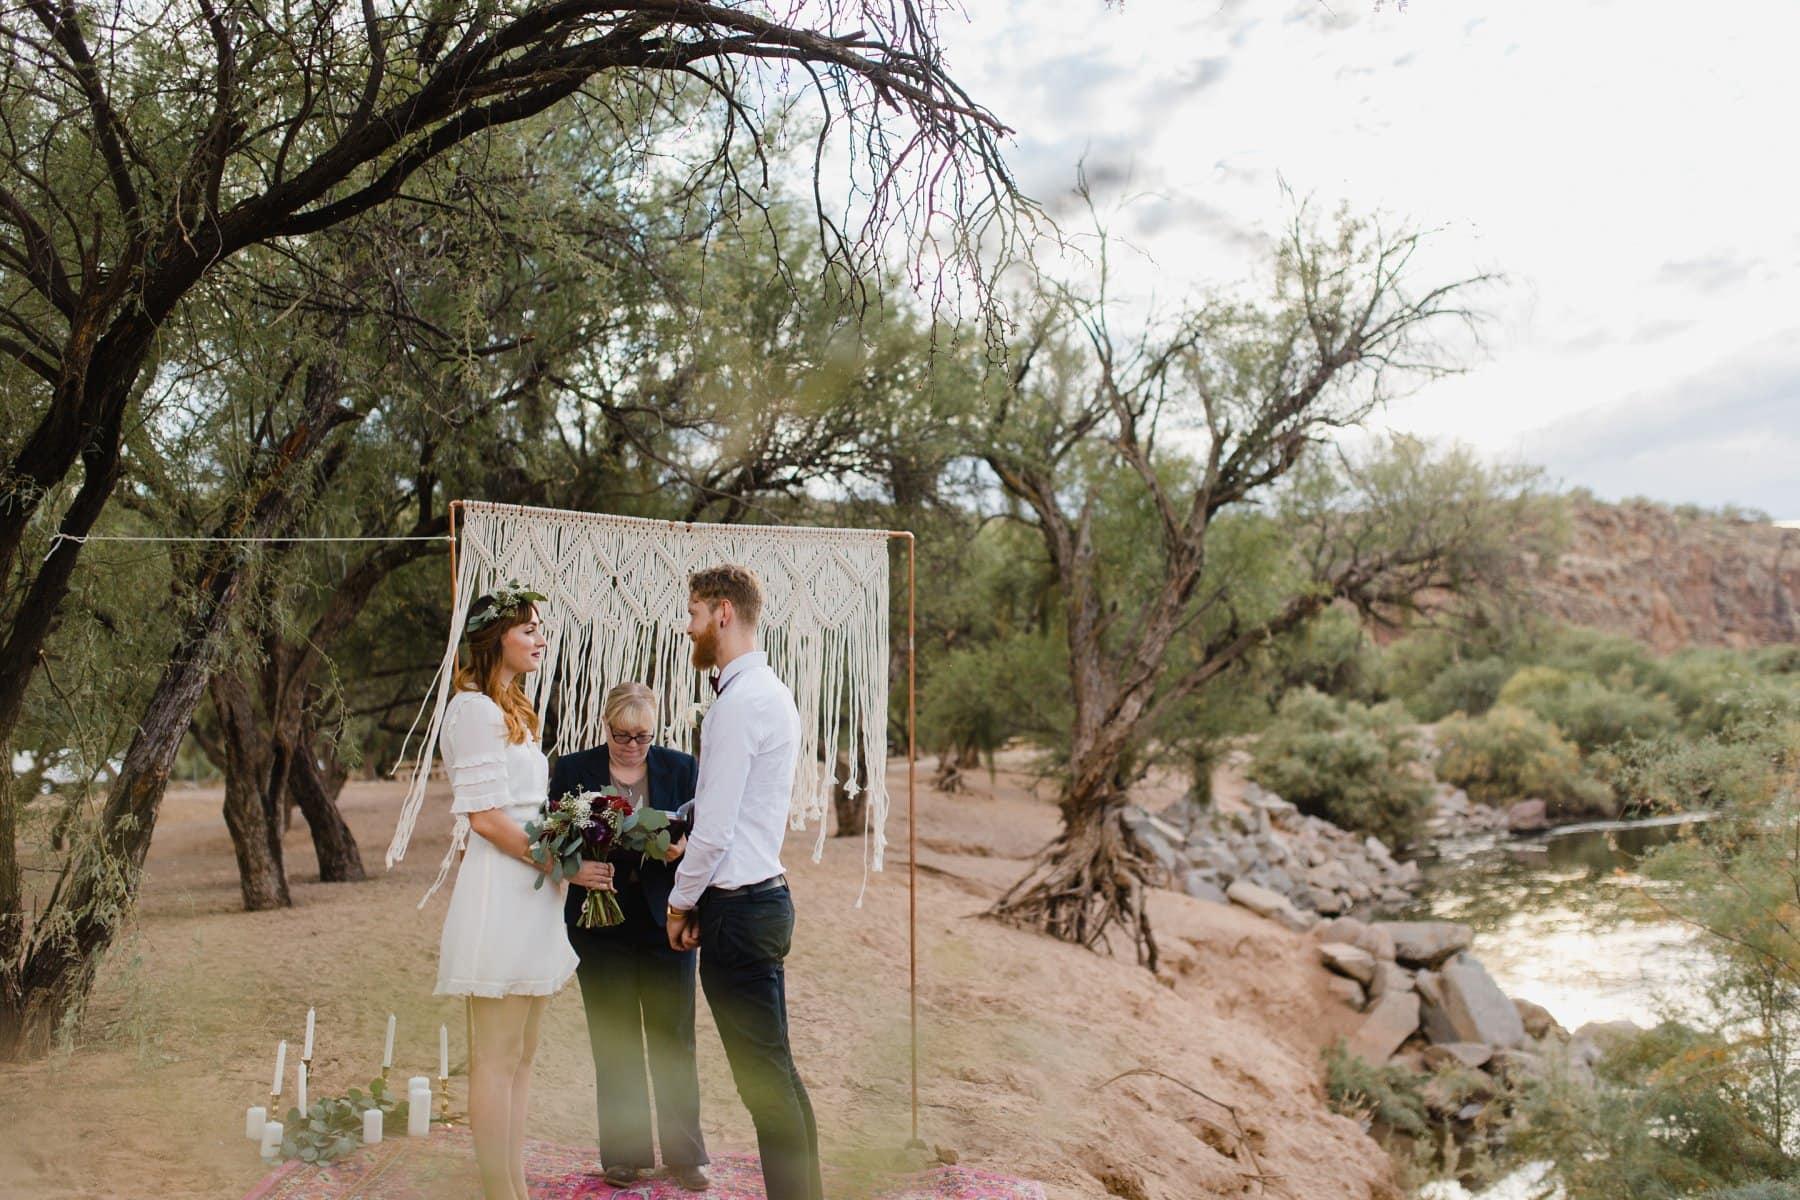 Salt River elopement with macrame ceremony backdrop